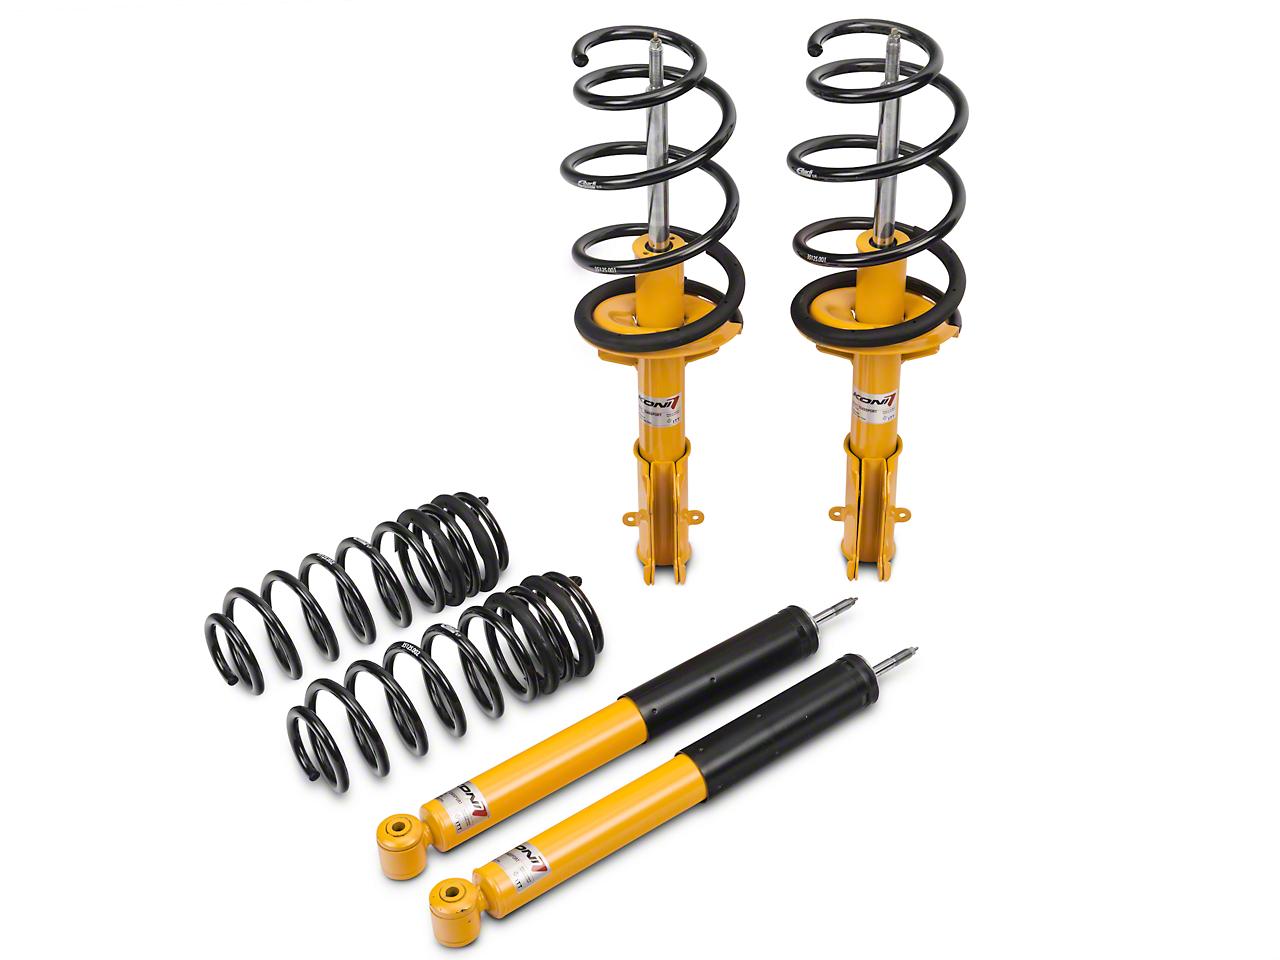 KONI Sport Adjustable Shock, Strut & Eibach Pro-Kit Lowering Spring Kit (11-14 GT, V6, BOSS)